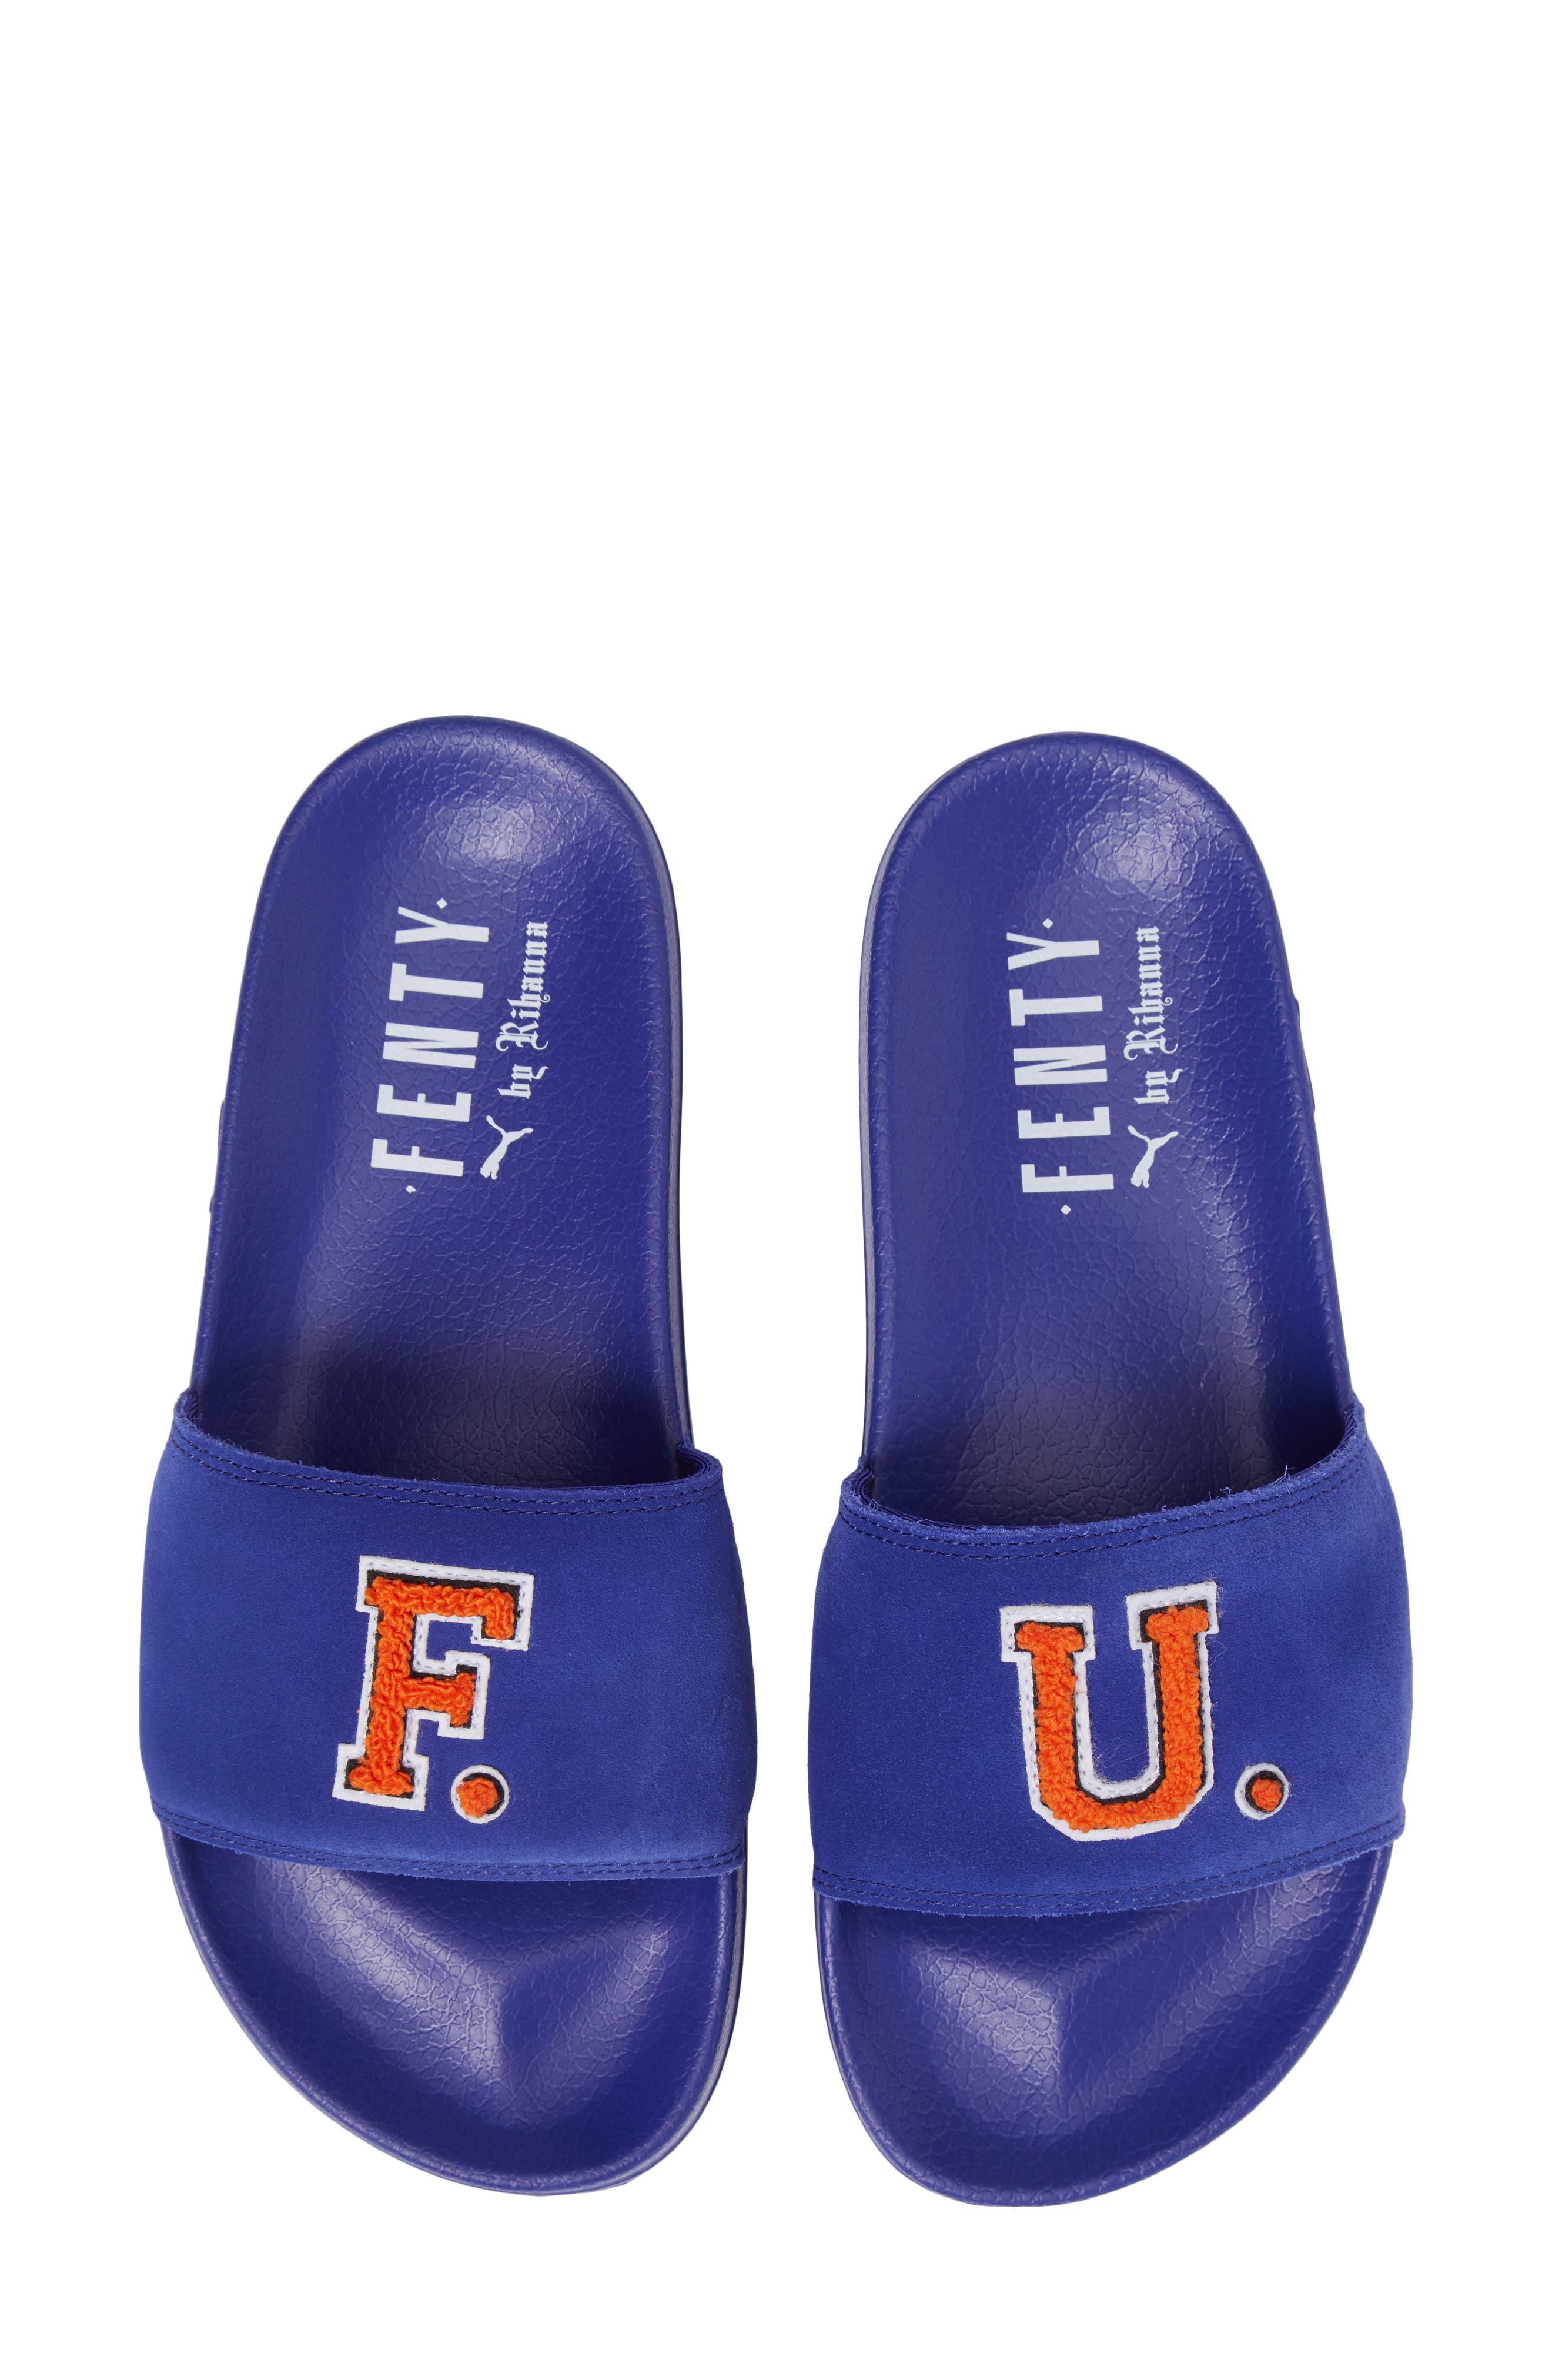 FENTY PUMA by Rihanna Lead Cat Slide Sandals,                             Alternate thumbnail 18, color,